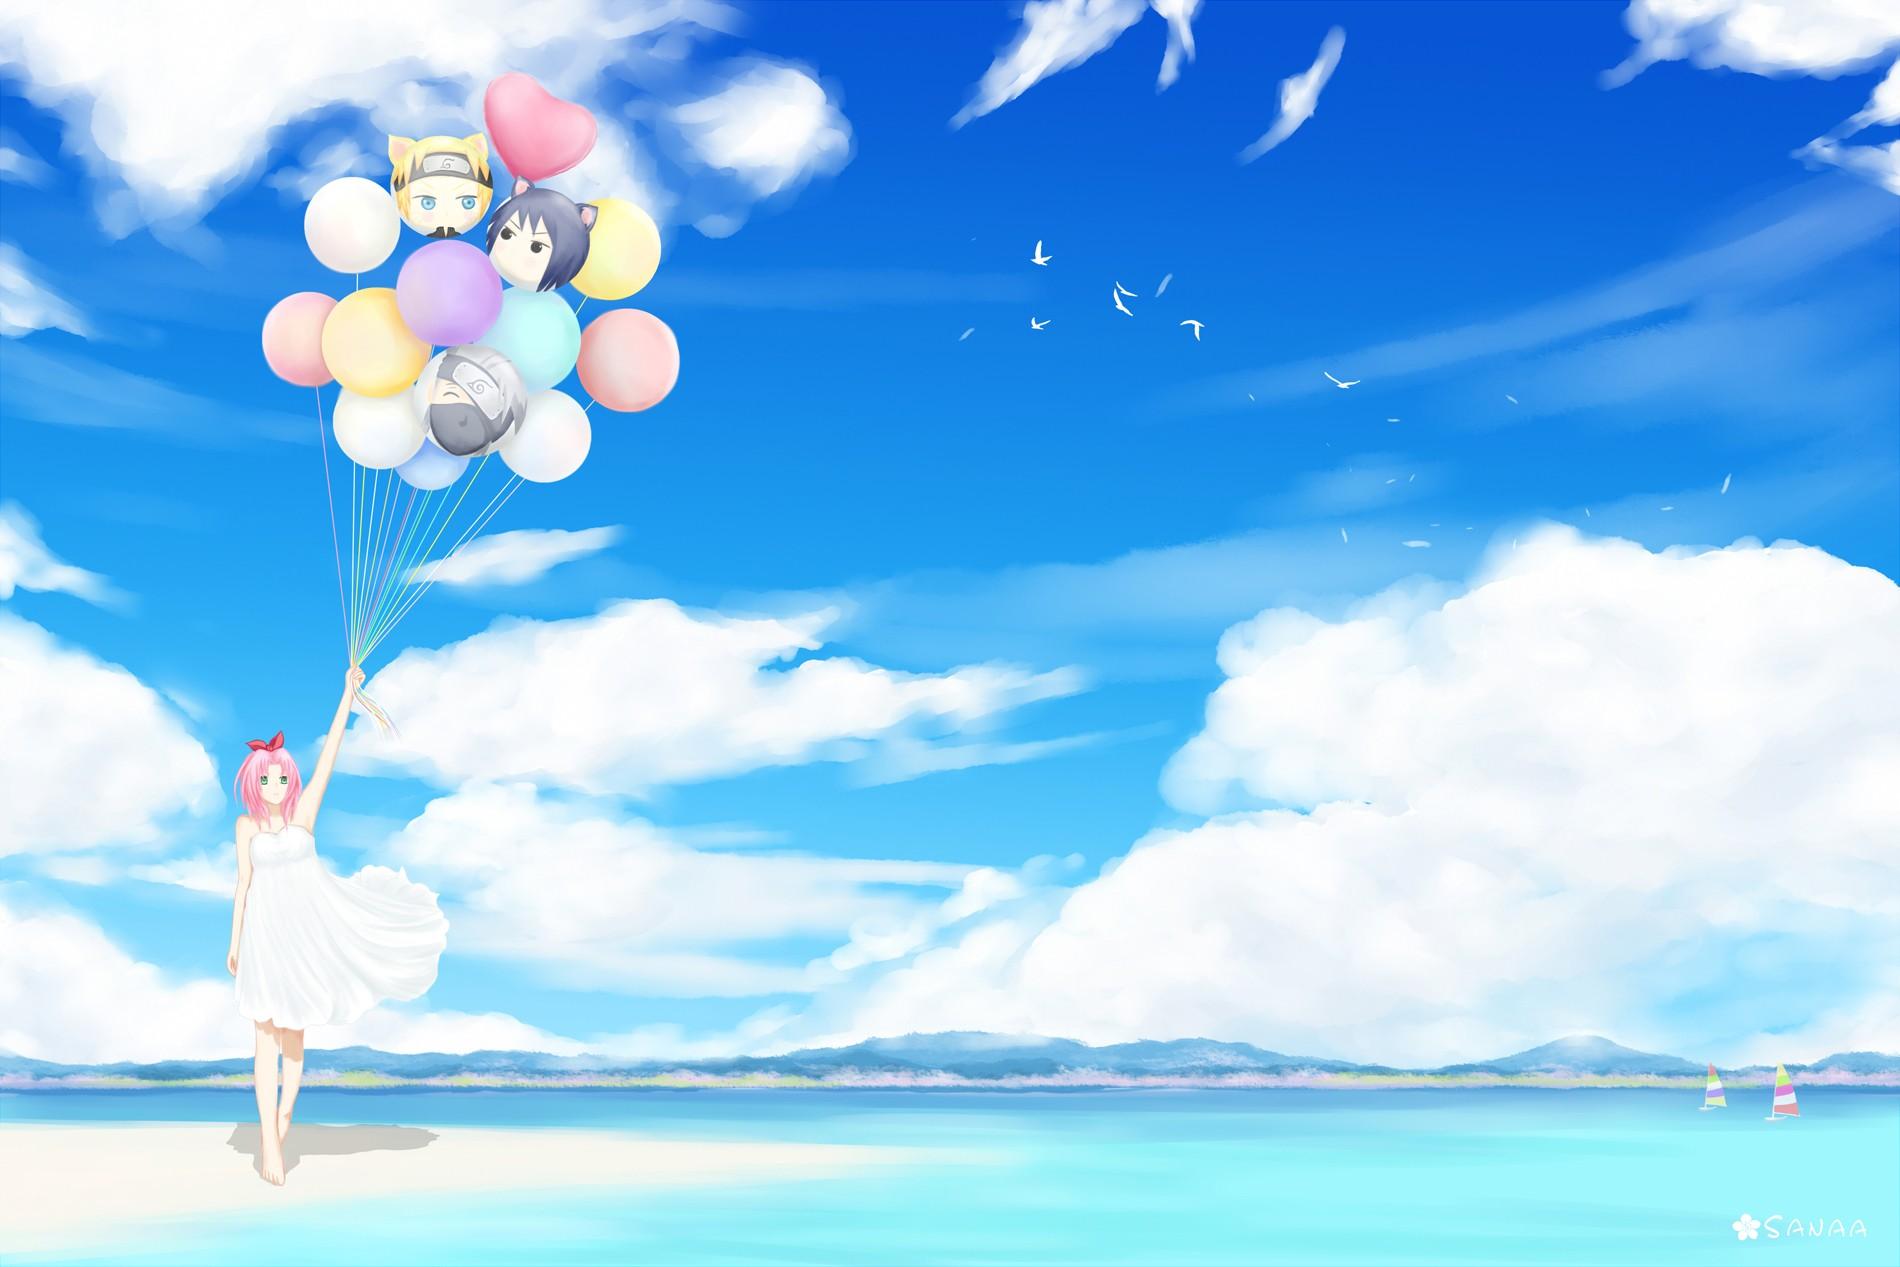 Top Wallpaper Naruto Blue - sunlight-birds-anime-anime-girls-sky-clouds-blue-Naruto-Shippuuden-Haruno-Sakura-balloon-Toy-cloud-flower-computer-wallpaper-221080  2018_1001865.jpg